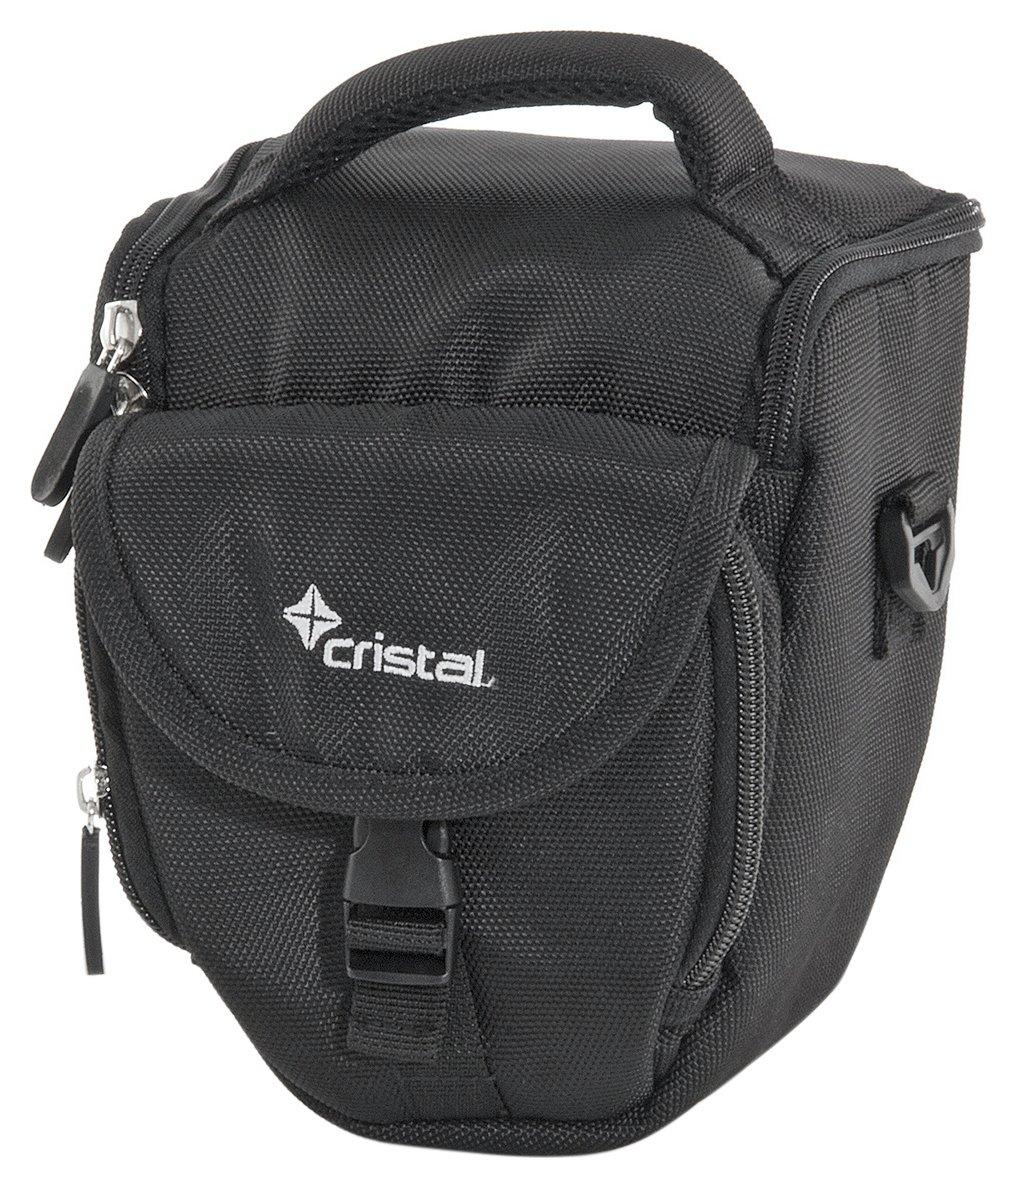 Cristal - Bridge - Camera Case - Black